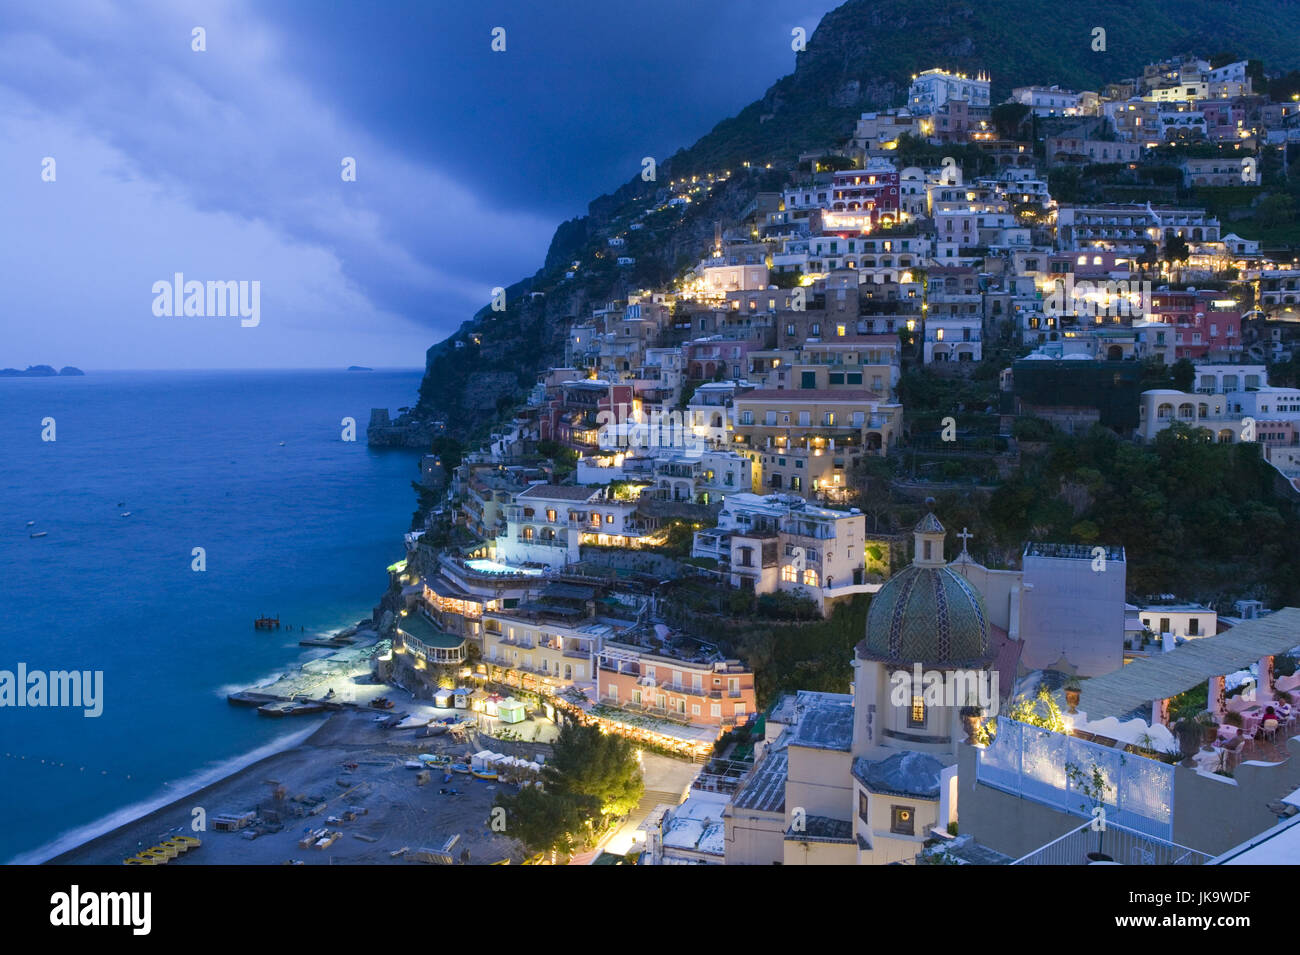 Italien, Kampanien, Amalfiküste, Positano, Stadtansicht, Abend, Lichter, Süditalien, Reiseziel, Stadt, Stockbild